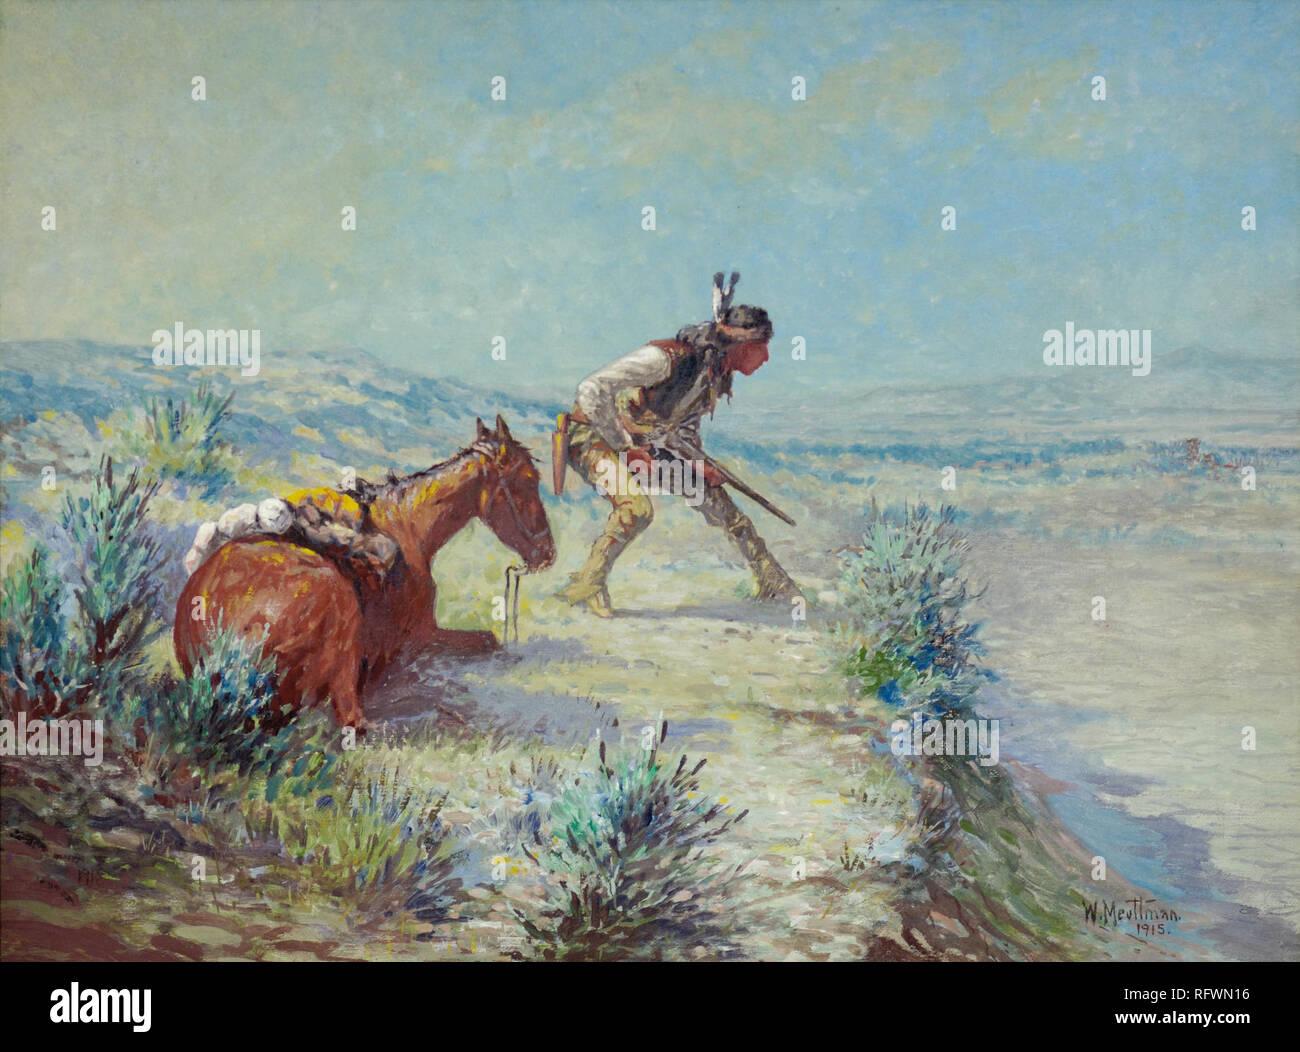 WILLIAM MEUTTMAN (1869-1948) el avance Scout (1915) - óleo sobre lienzo.jpg - RFWN16 Foto de stock